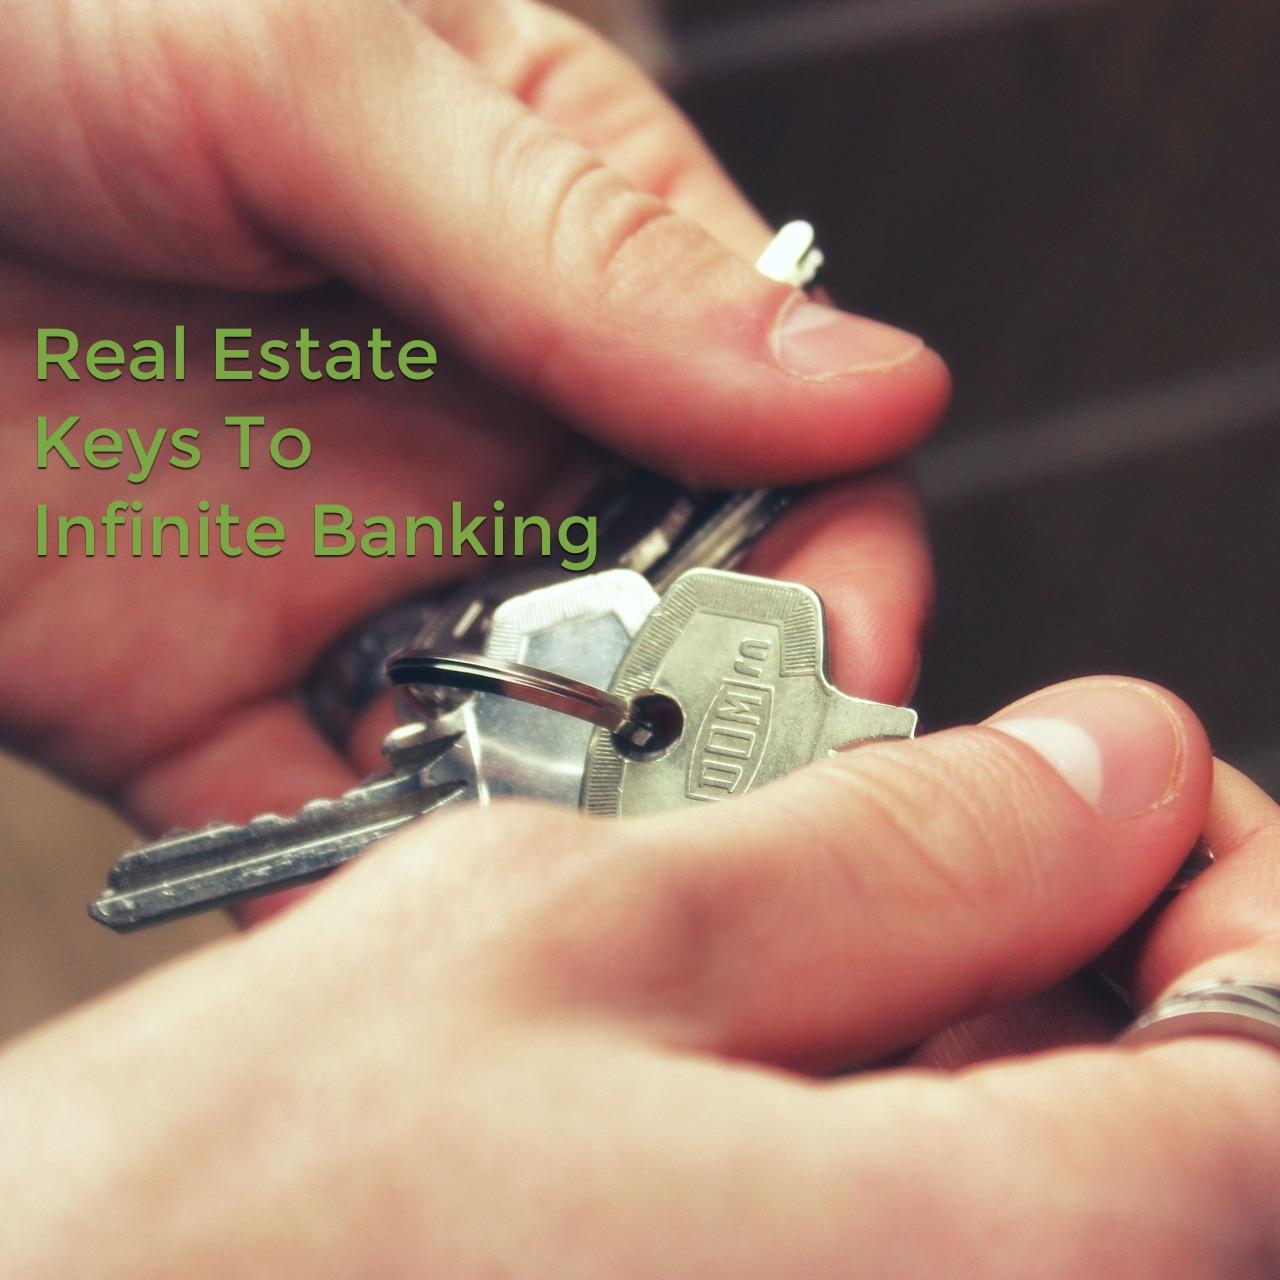 Real Estate Investors Utilize Infinite Banking Concept